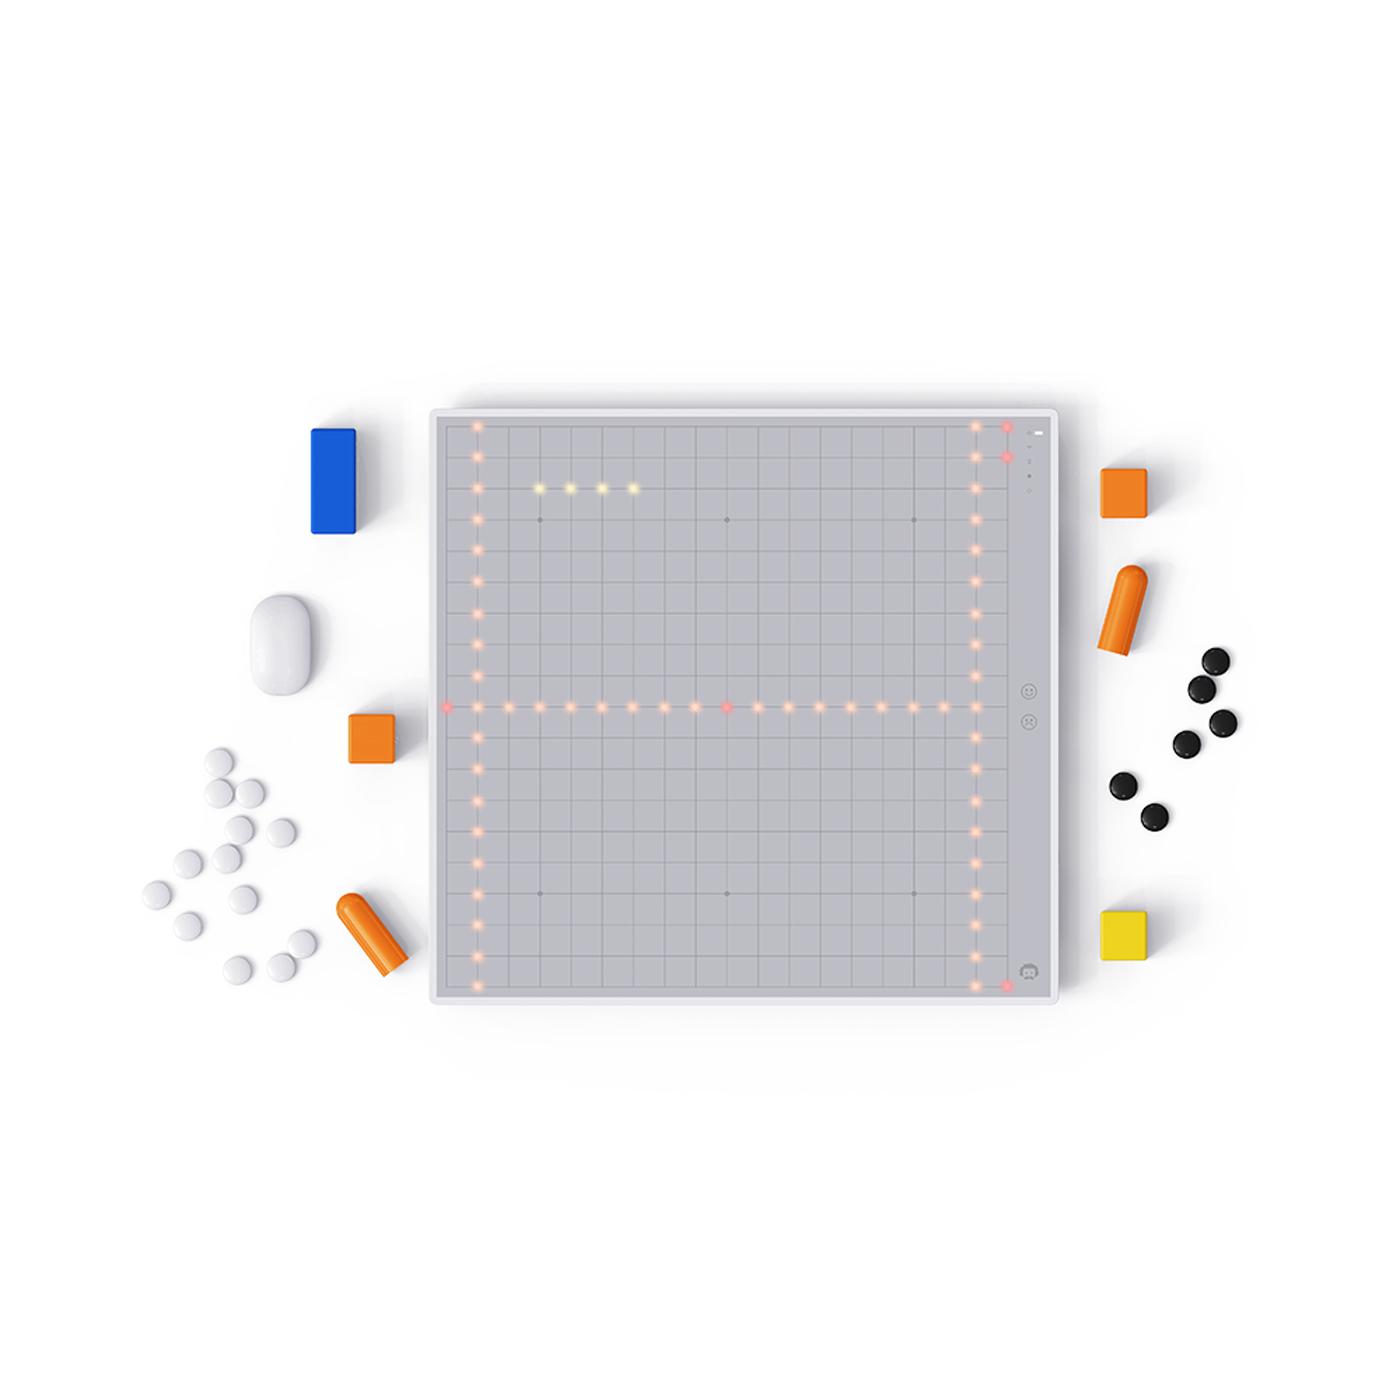 Product-OTPARVOS-01